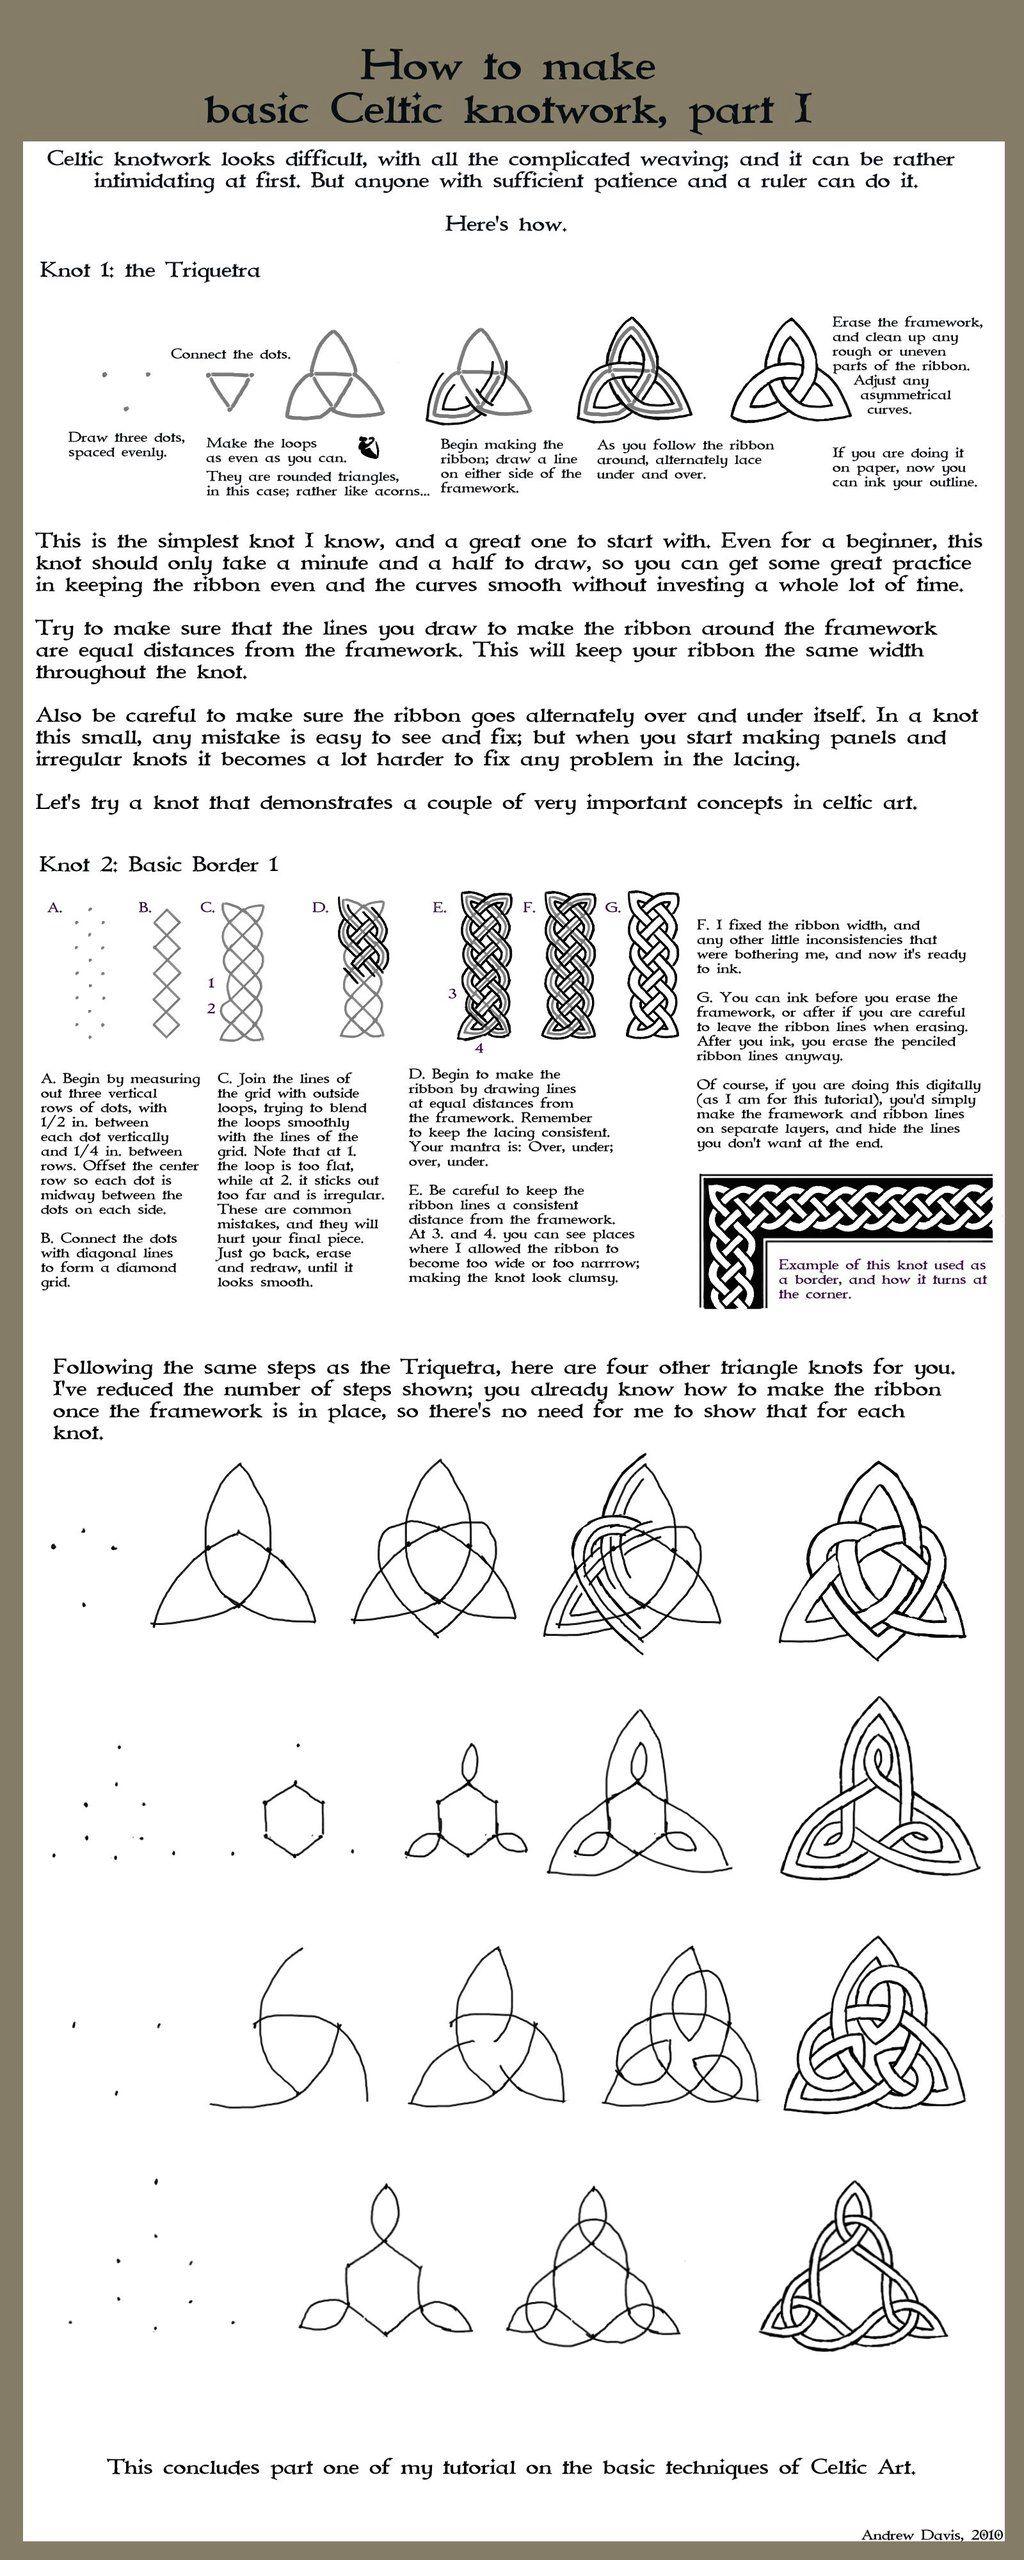 Pin By Delma Kennedy On Knots Pinterest Celtic Knots Celtic Art